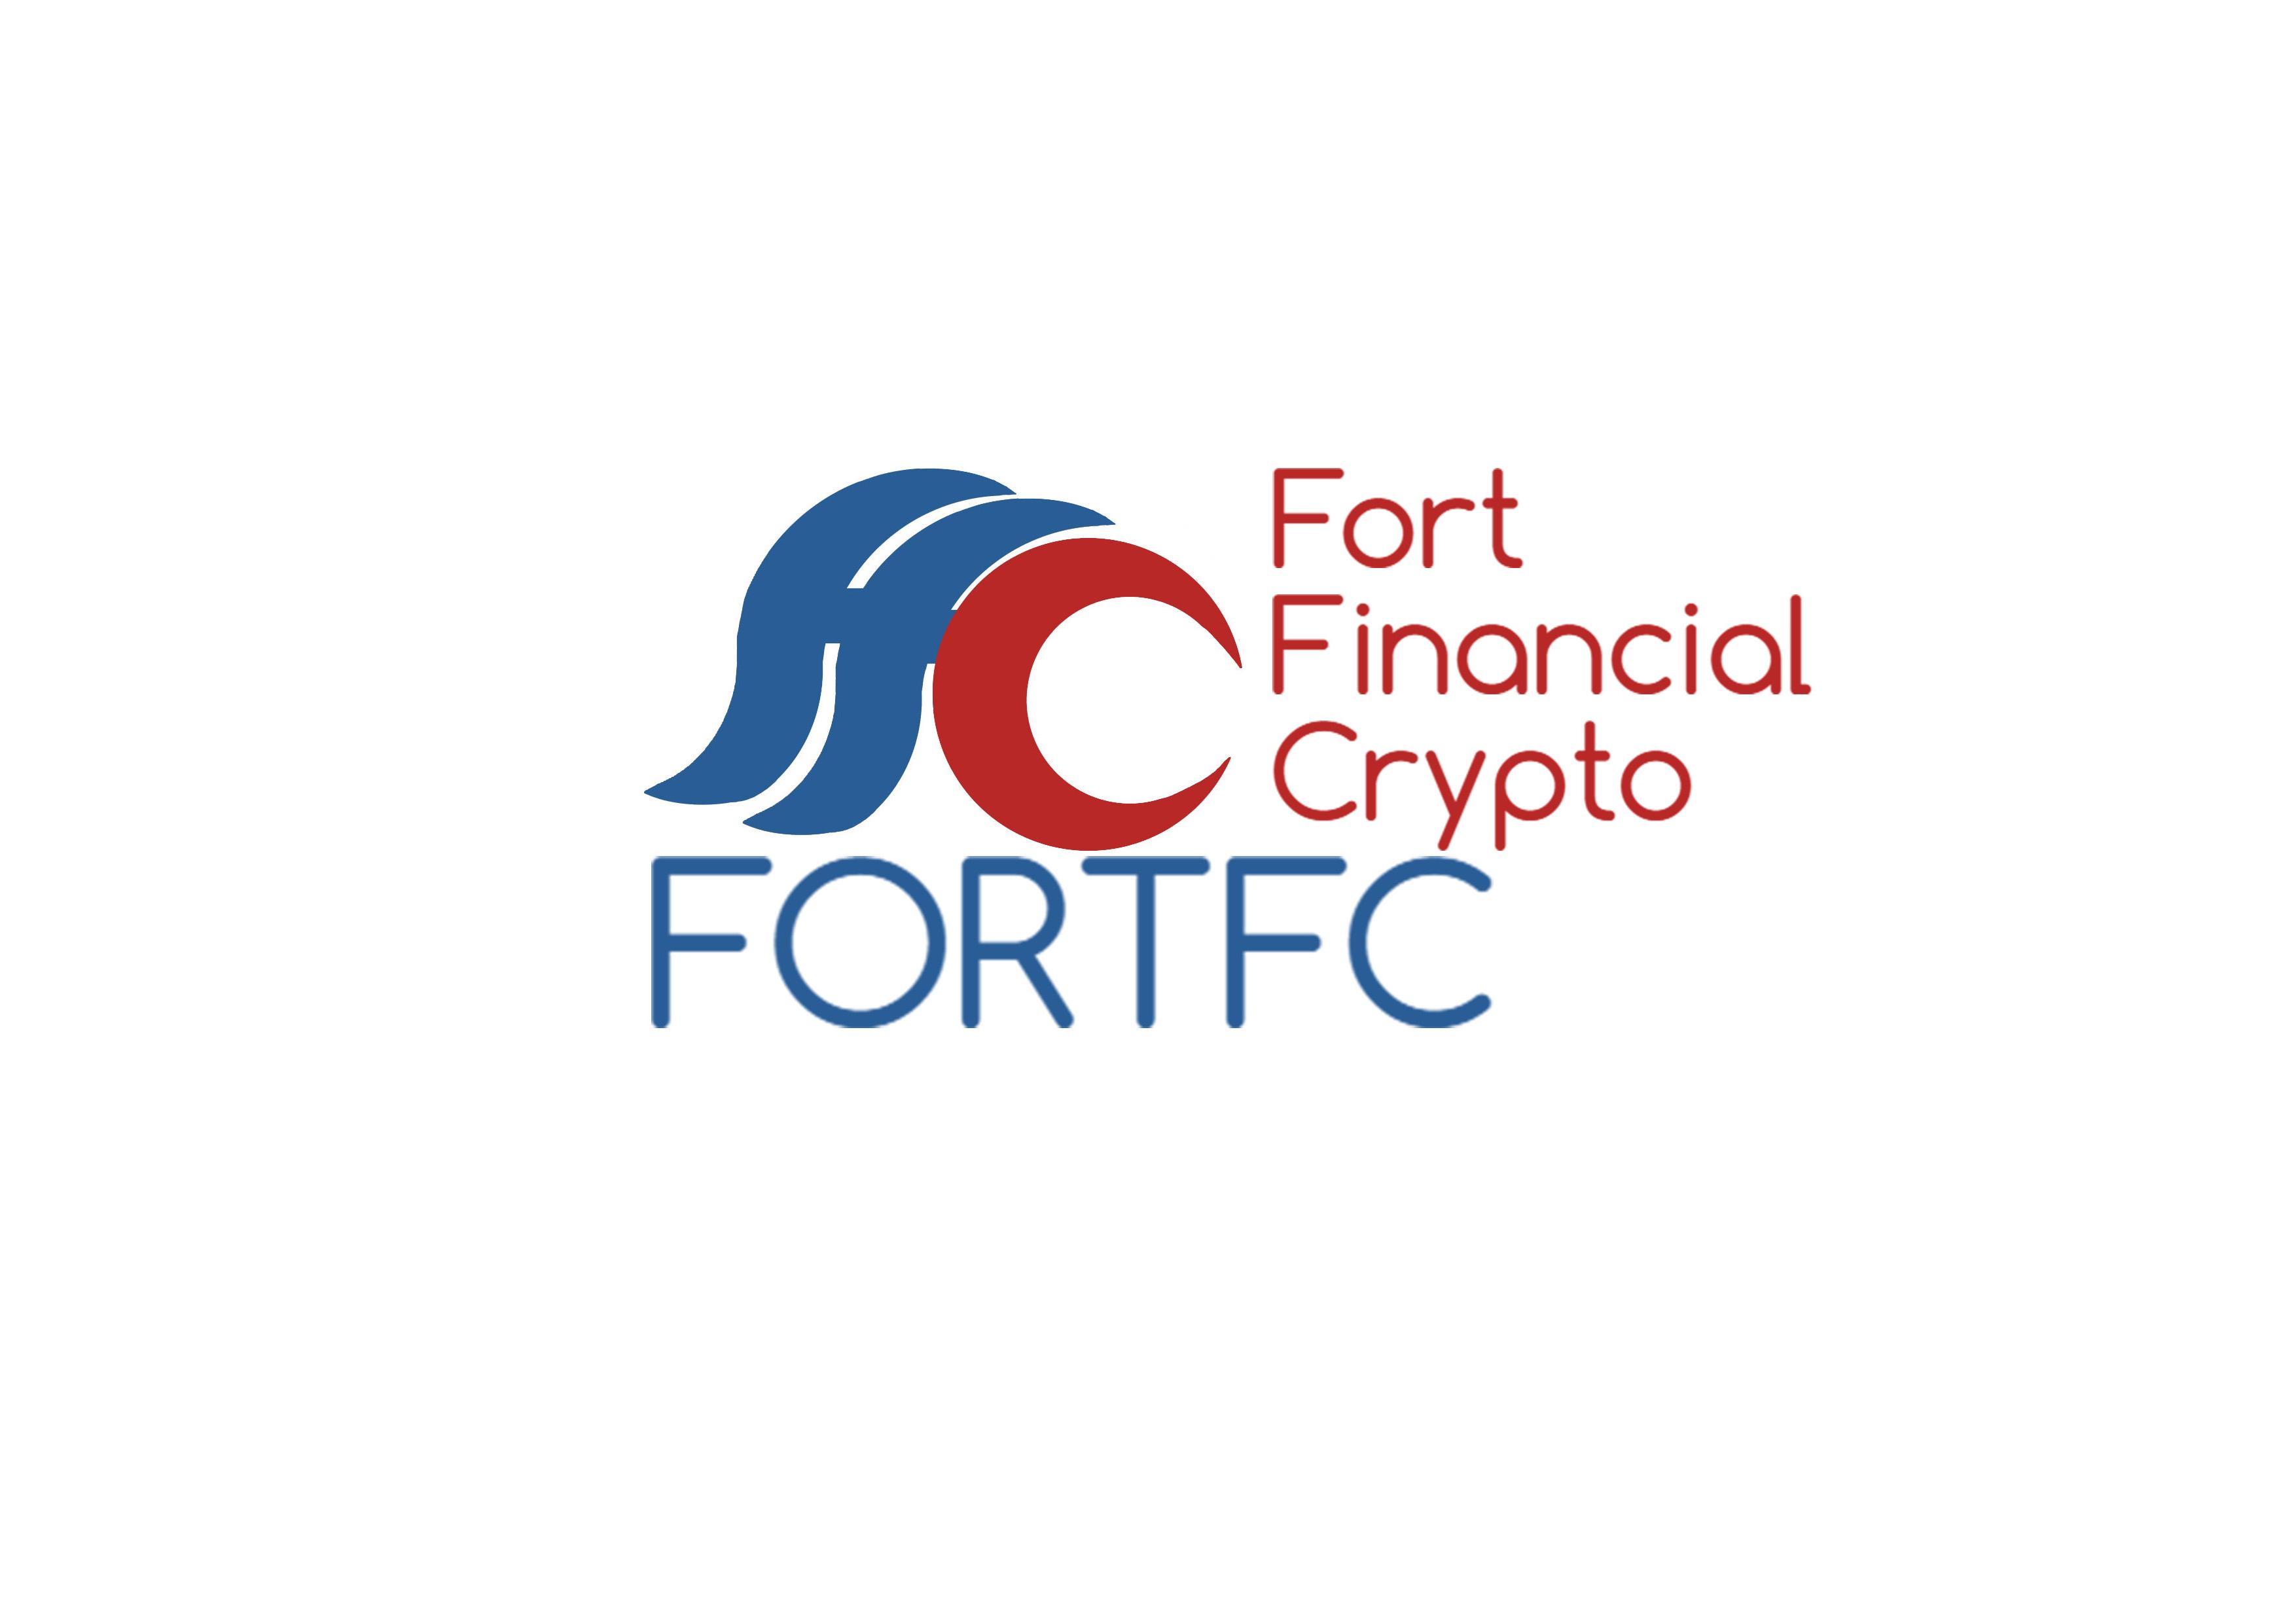 Разработка логотипа финансовой компании фото f_6685a86fb2294cd9.jpg